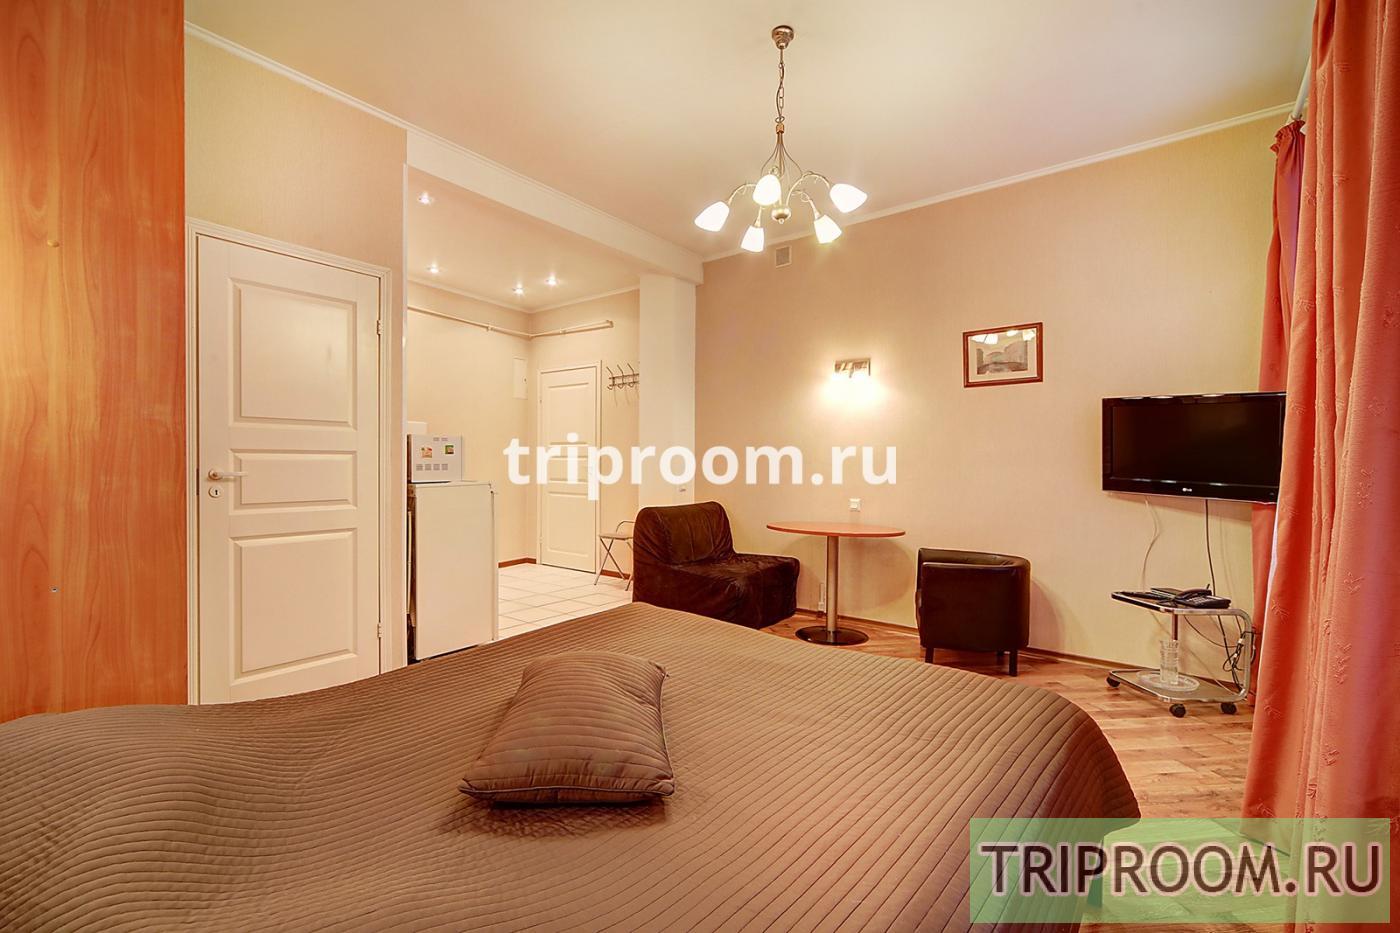 1-комнатная квартира посуточно (вариант № 15082), ул. Невский проспект, фото № 4